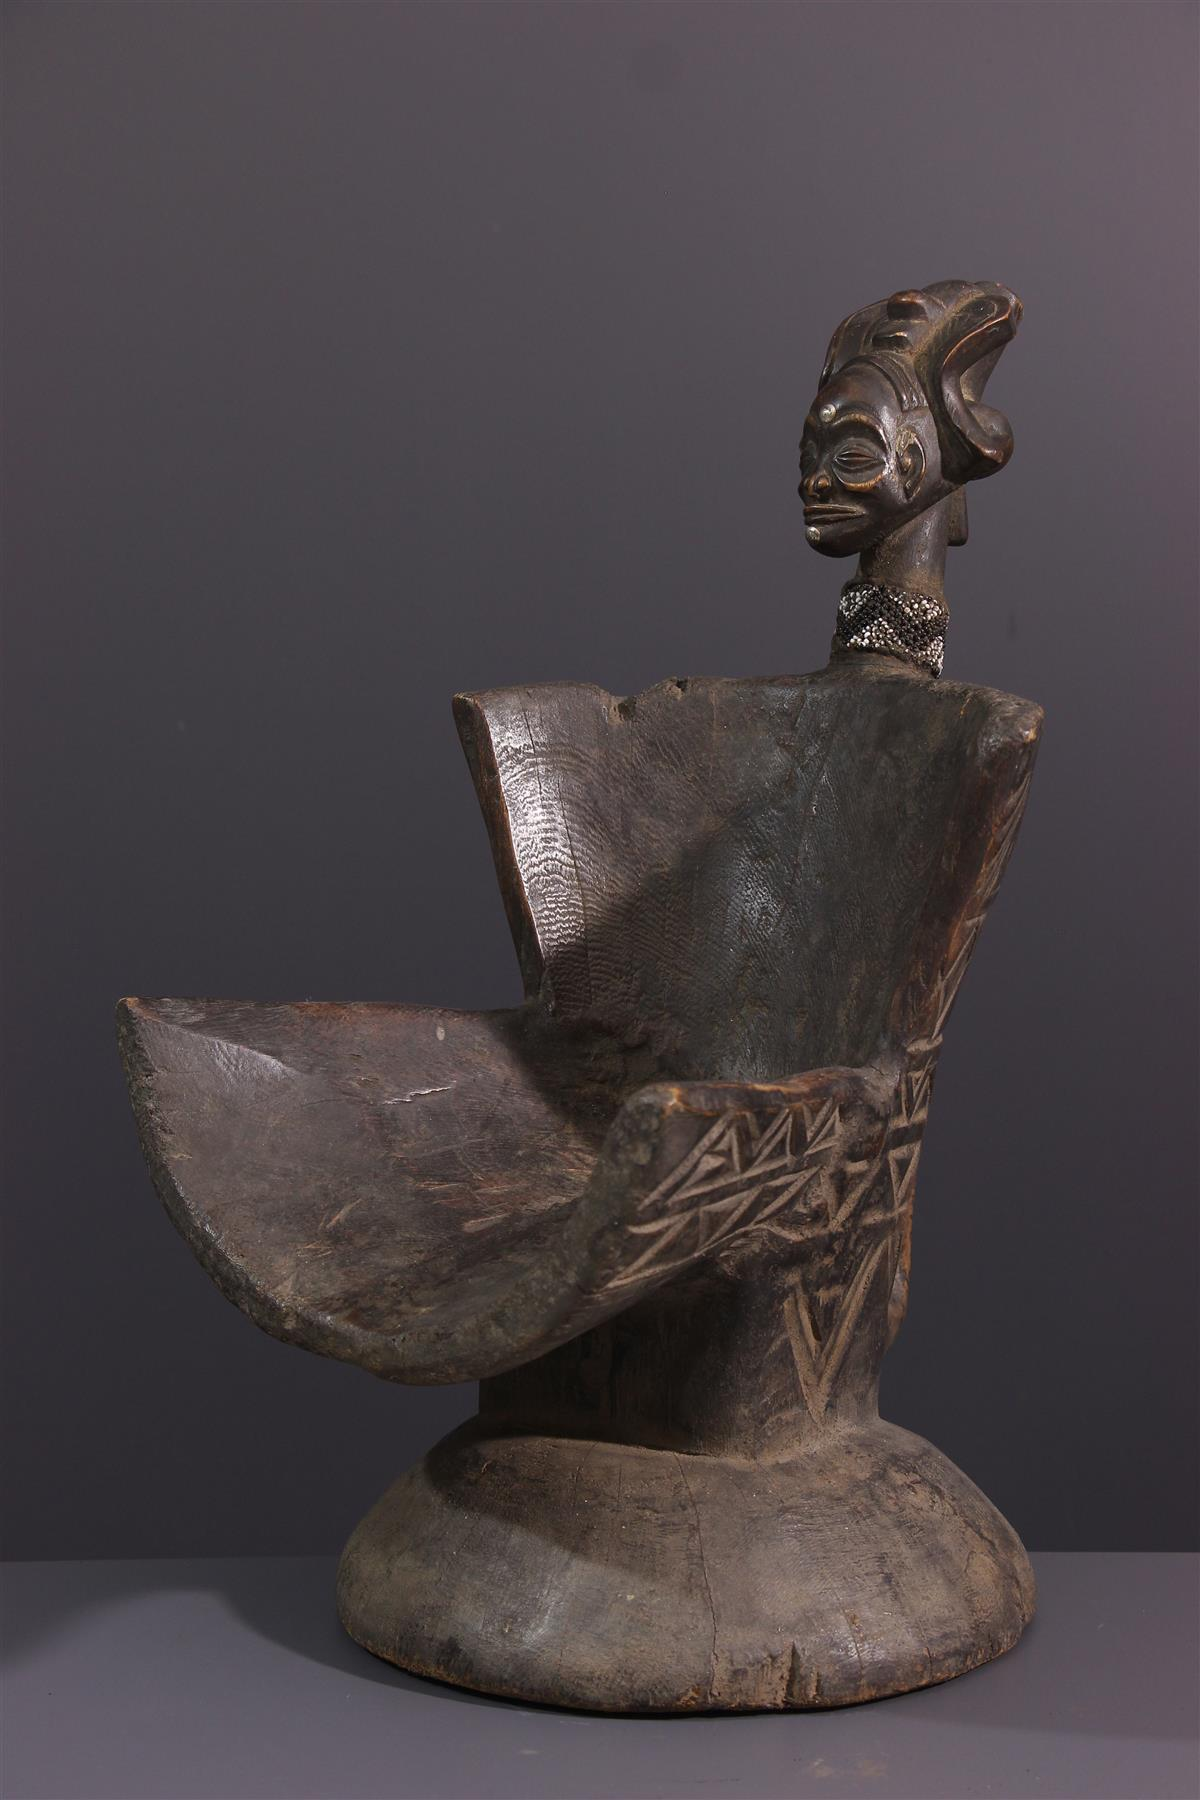 Chokwe Seat - Tribal art